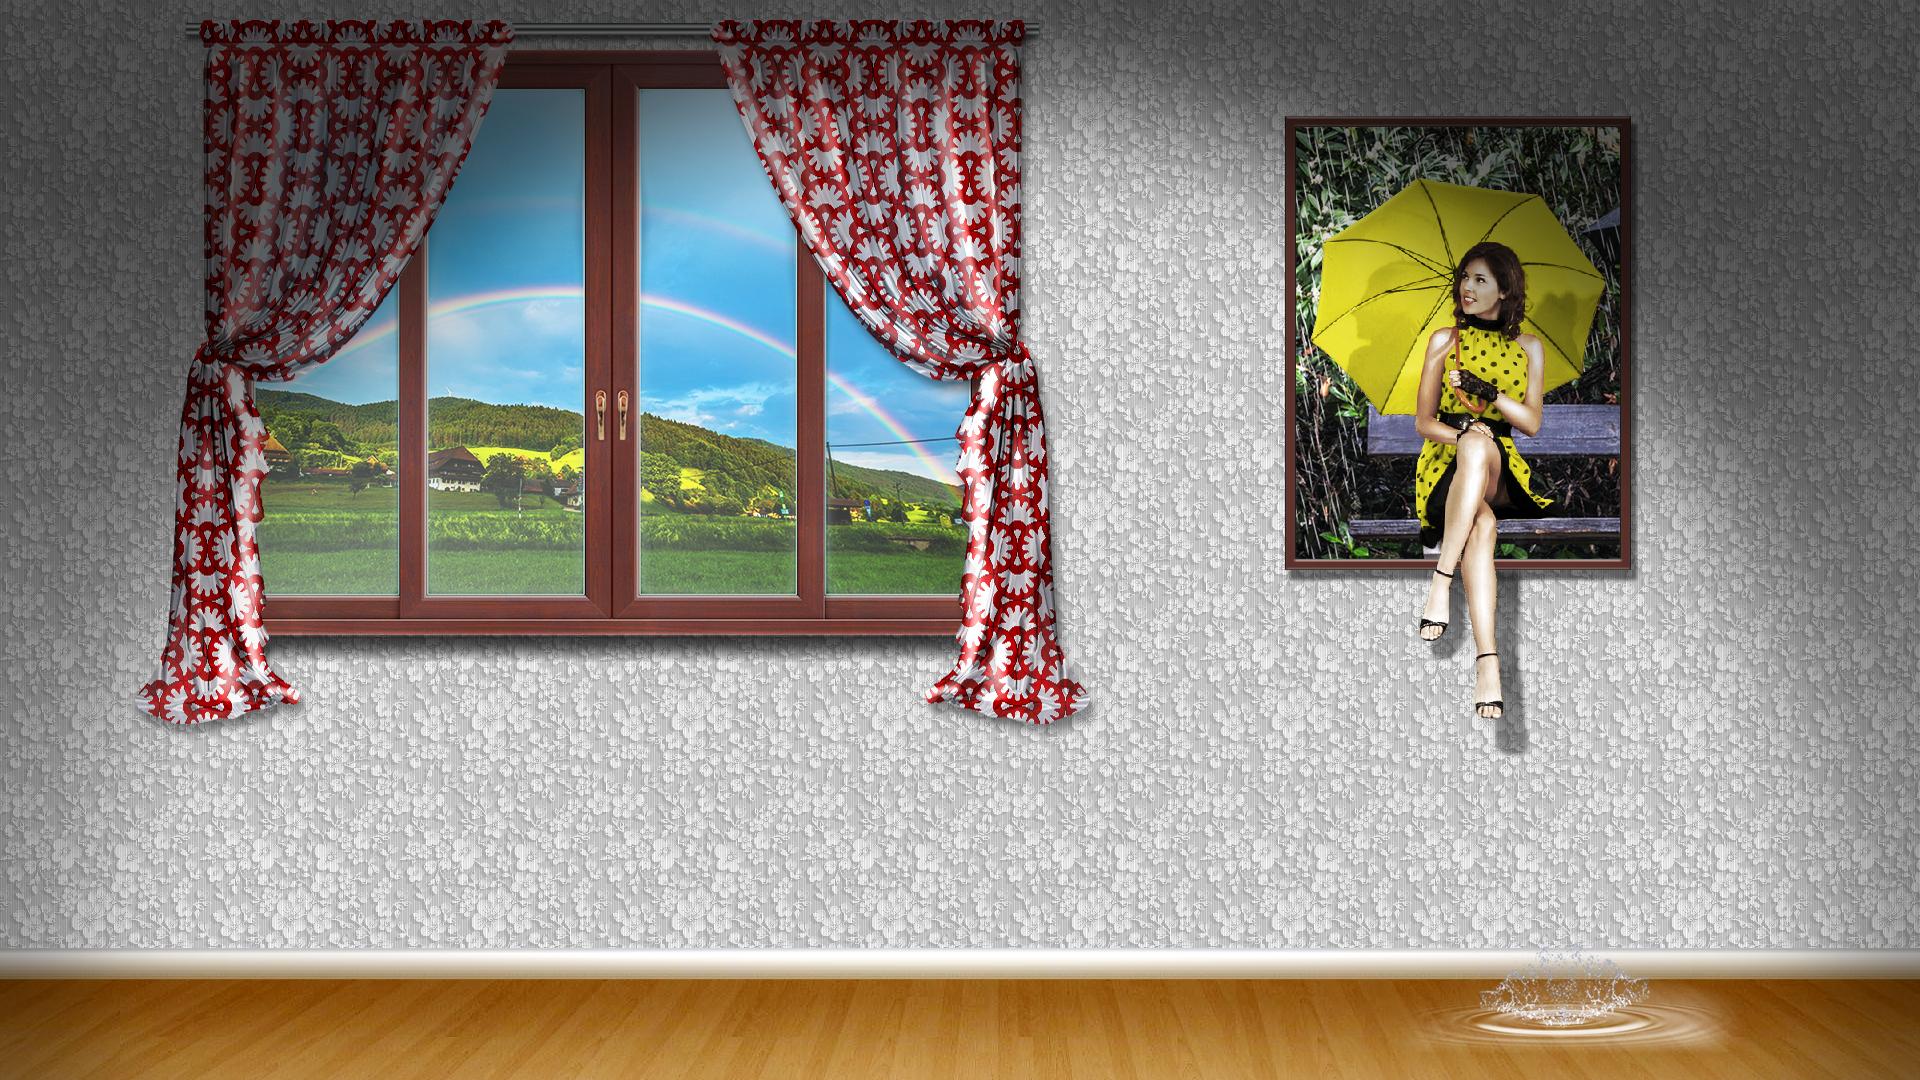 Fondos de pantalla : lluvia, paraguas, mujer, cortina, ventana ...